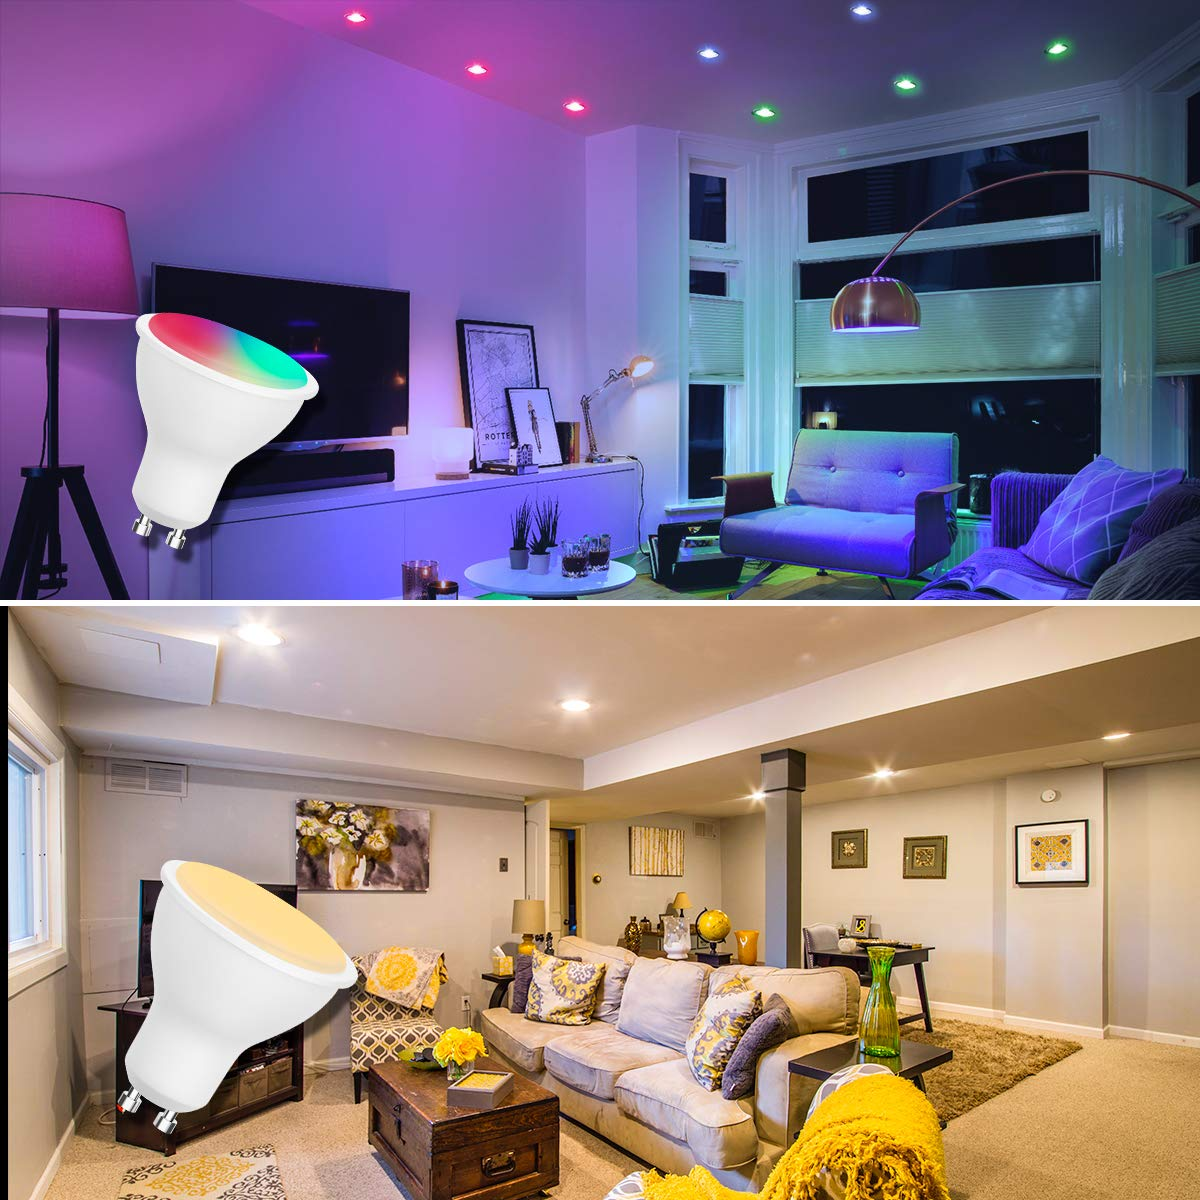 Colour Changing Bulbs,RGB LED Bulb,JandCase GU10 Light Bulb